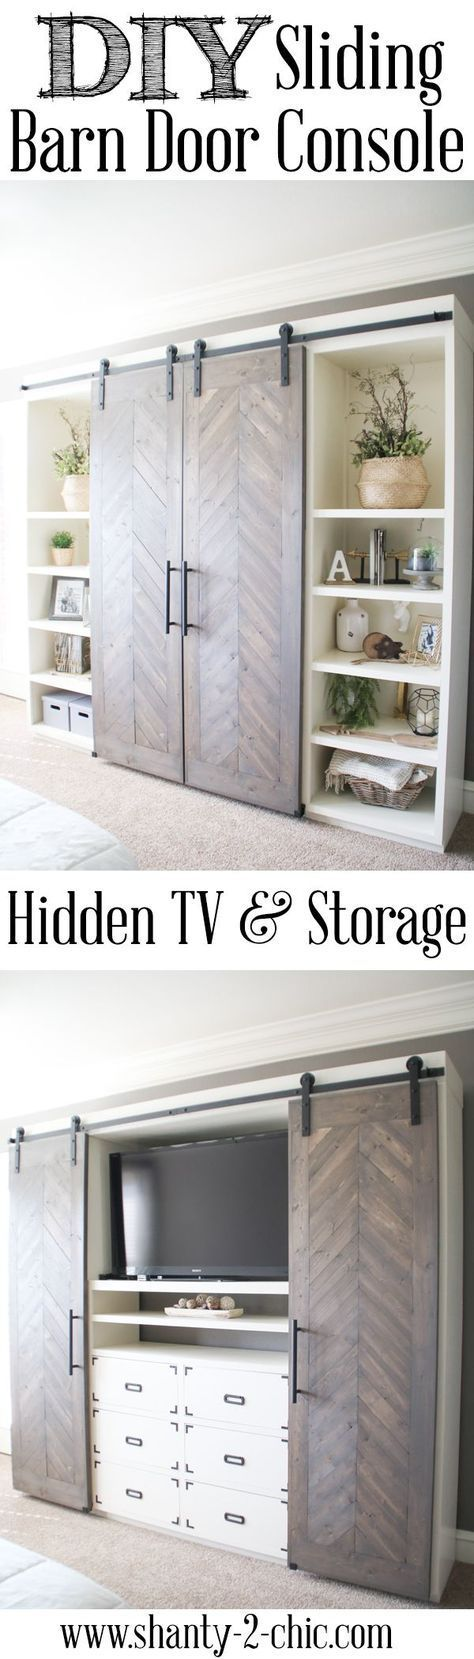 Hidden Media Storage